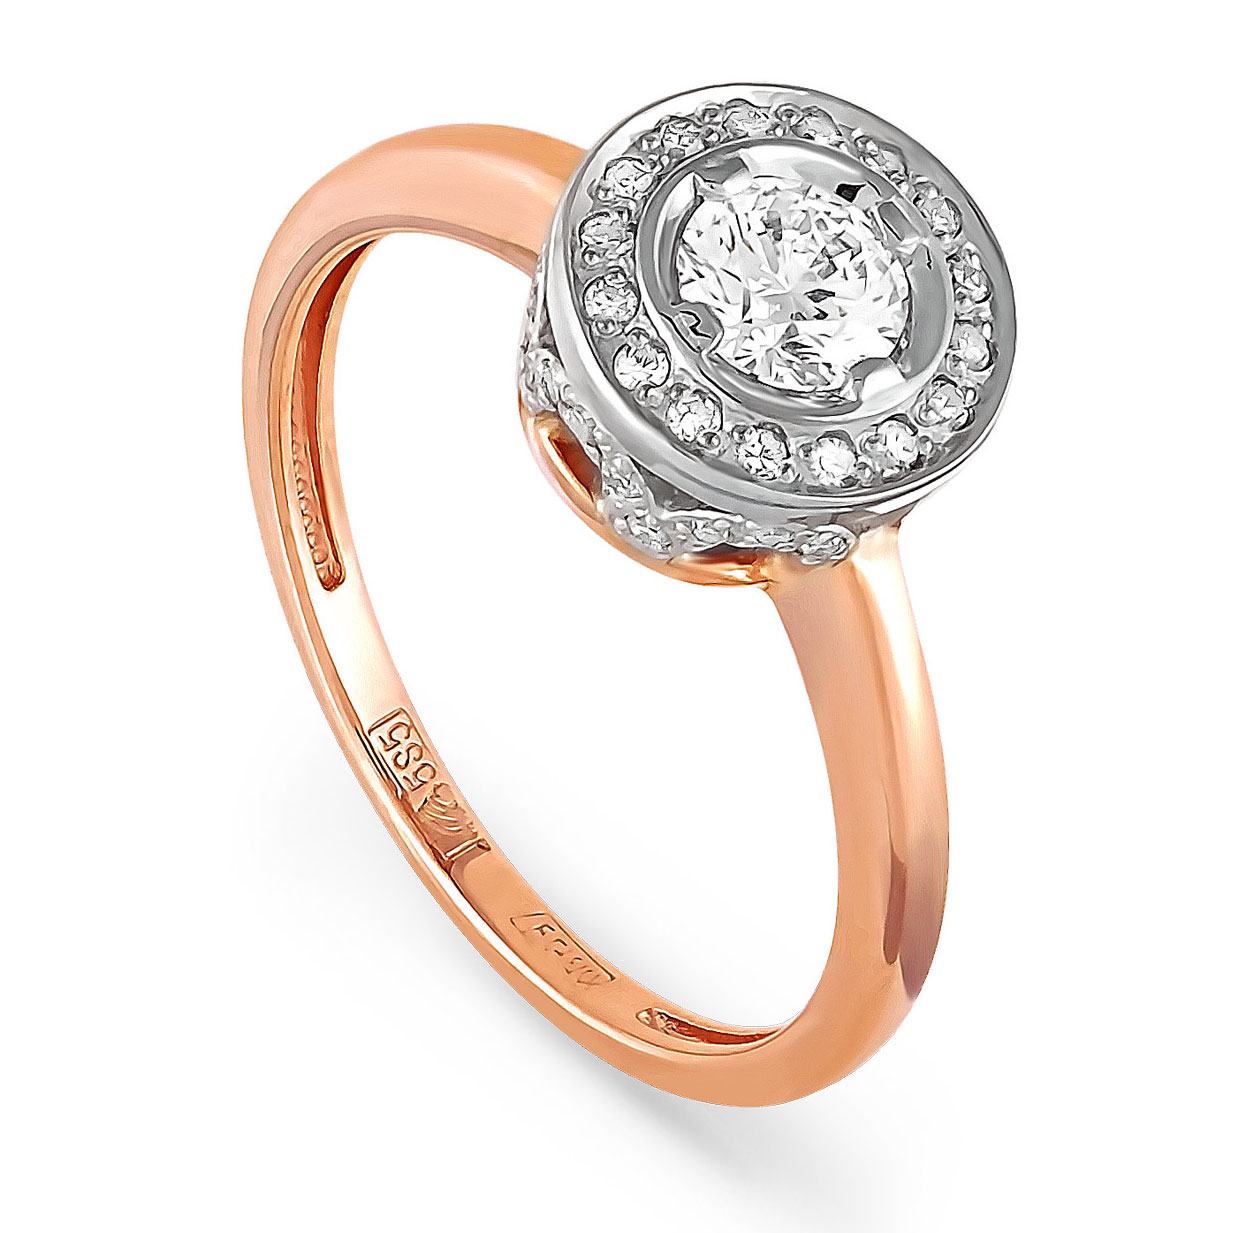 Золотое кольцо Бриллиант арт. 11-0392-1000 11-0392-1000